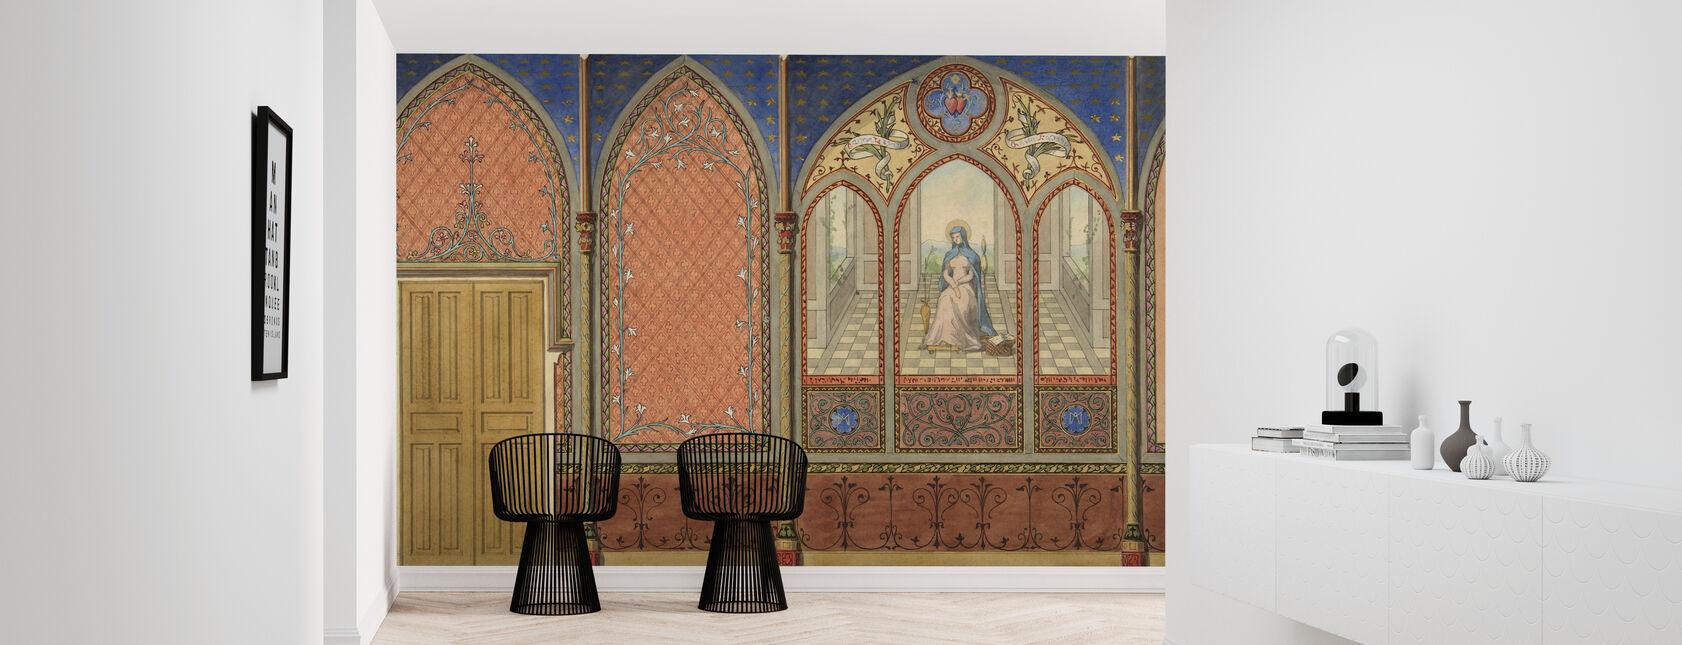 Elevation of a Church - Jules Edmond Charles Lachaise - Wallpaper - Hallway